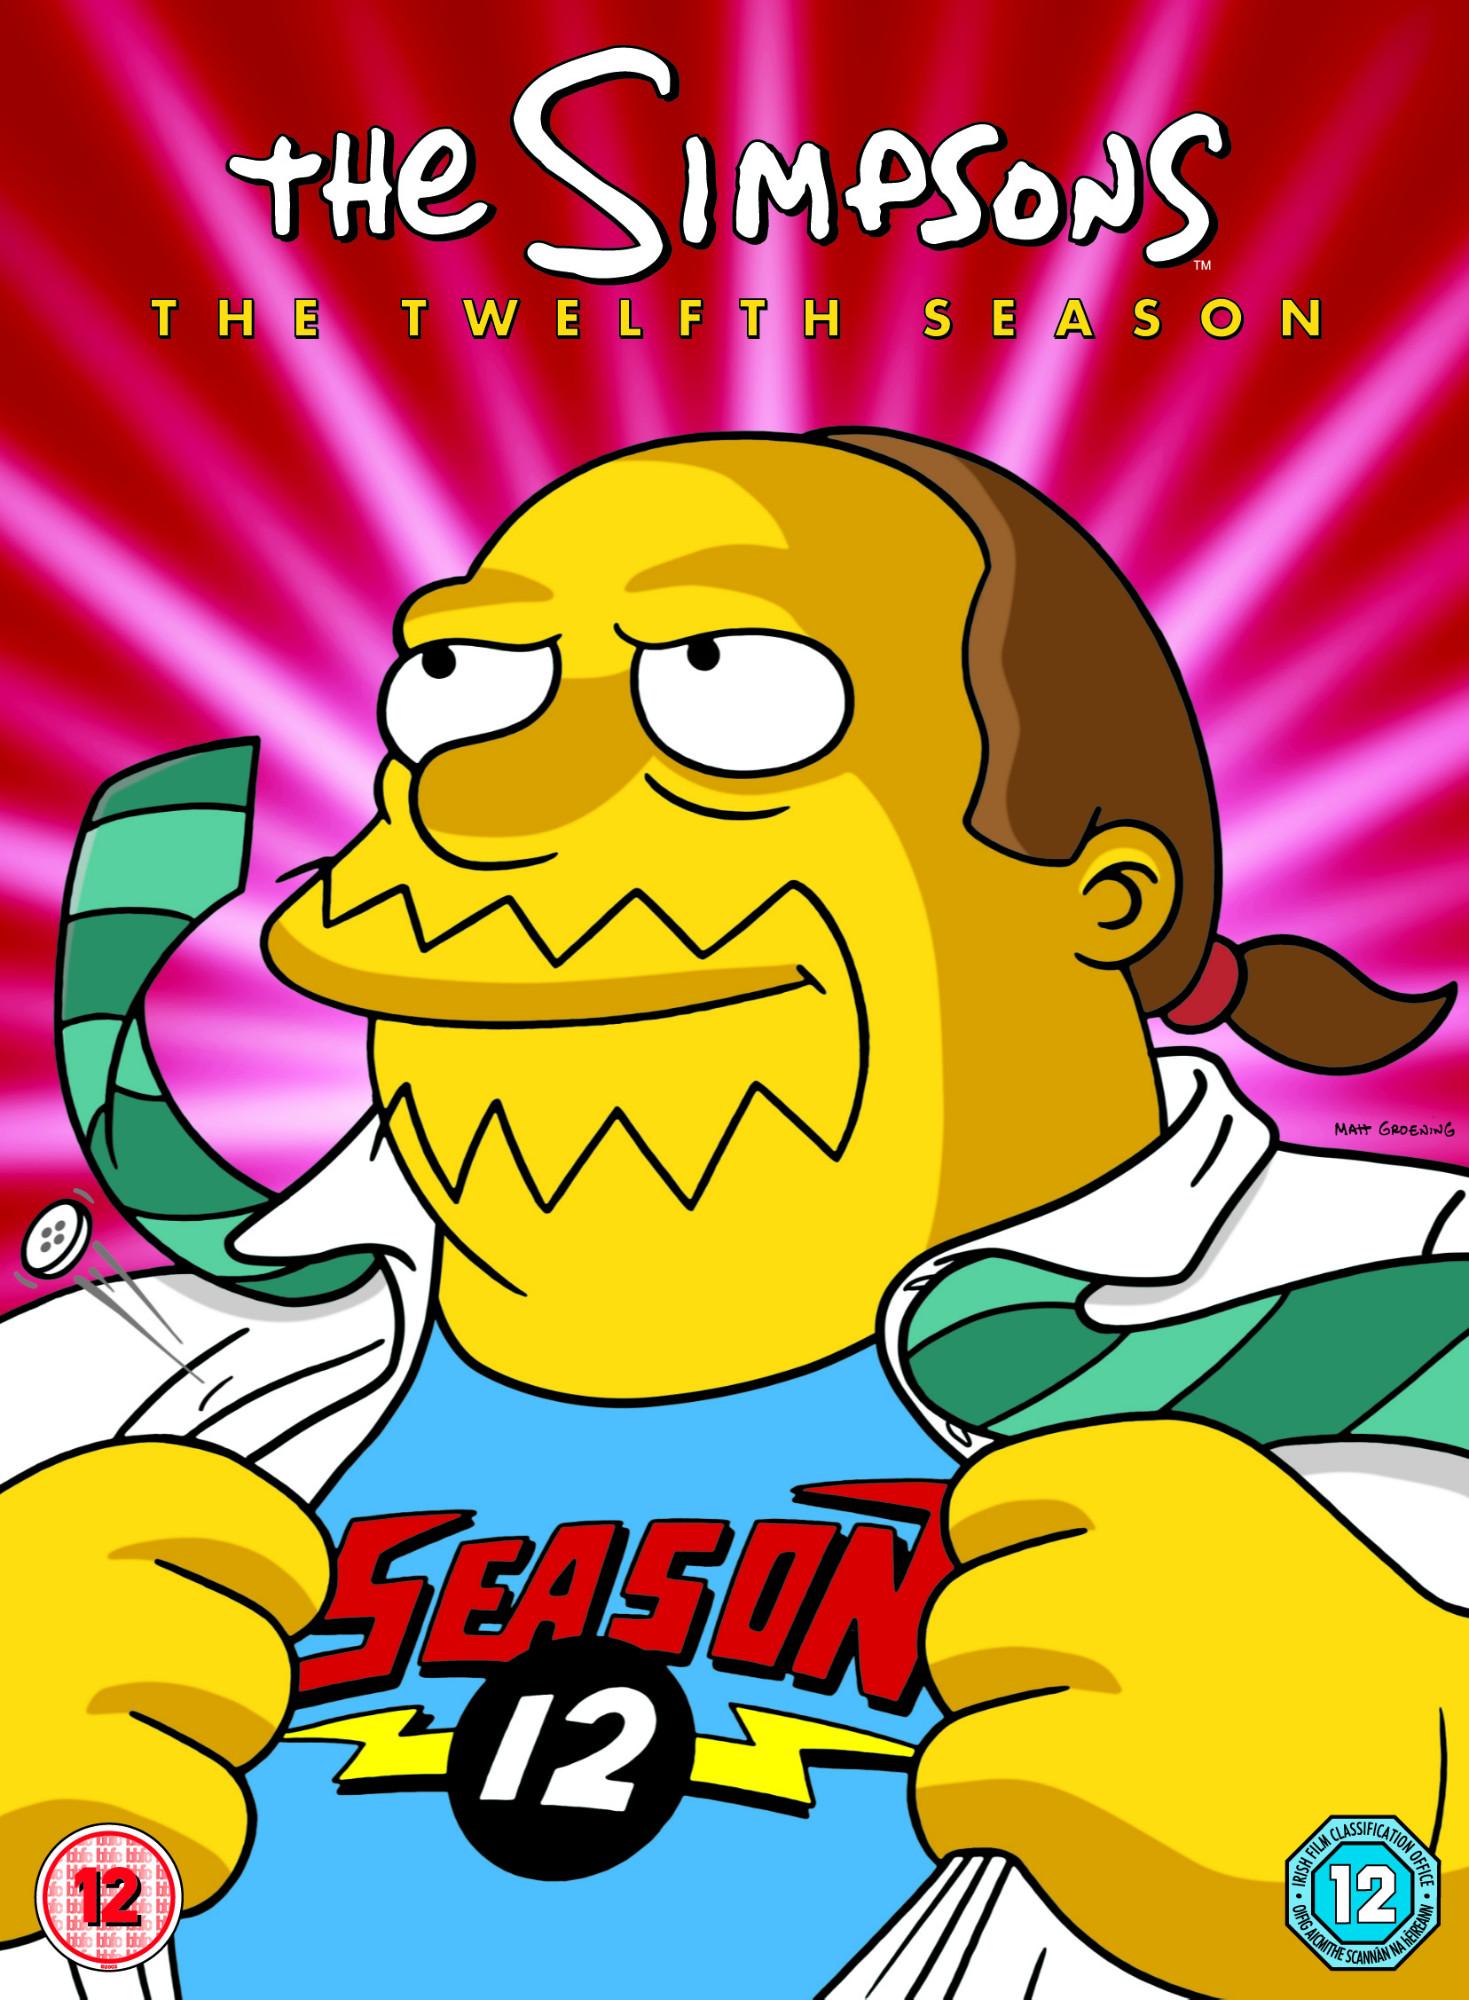 The Simpsons: Season 12